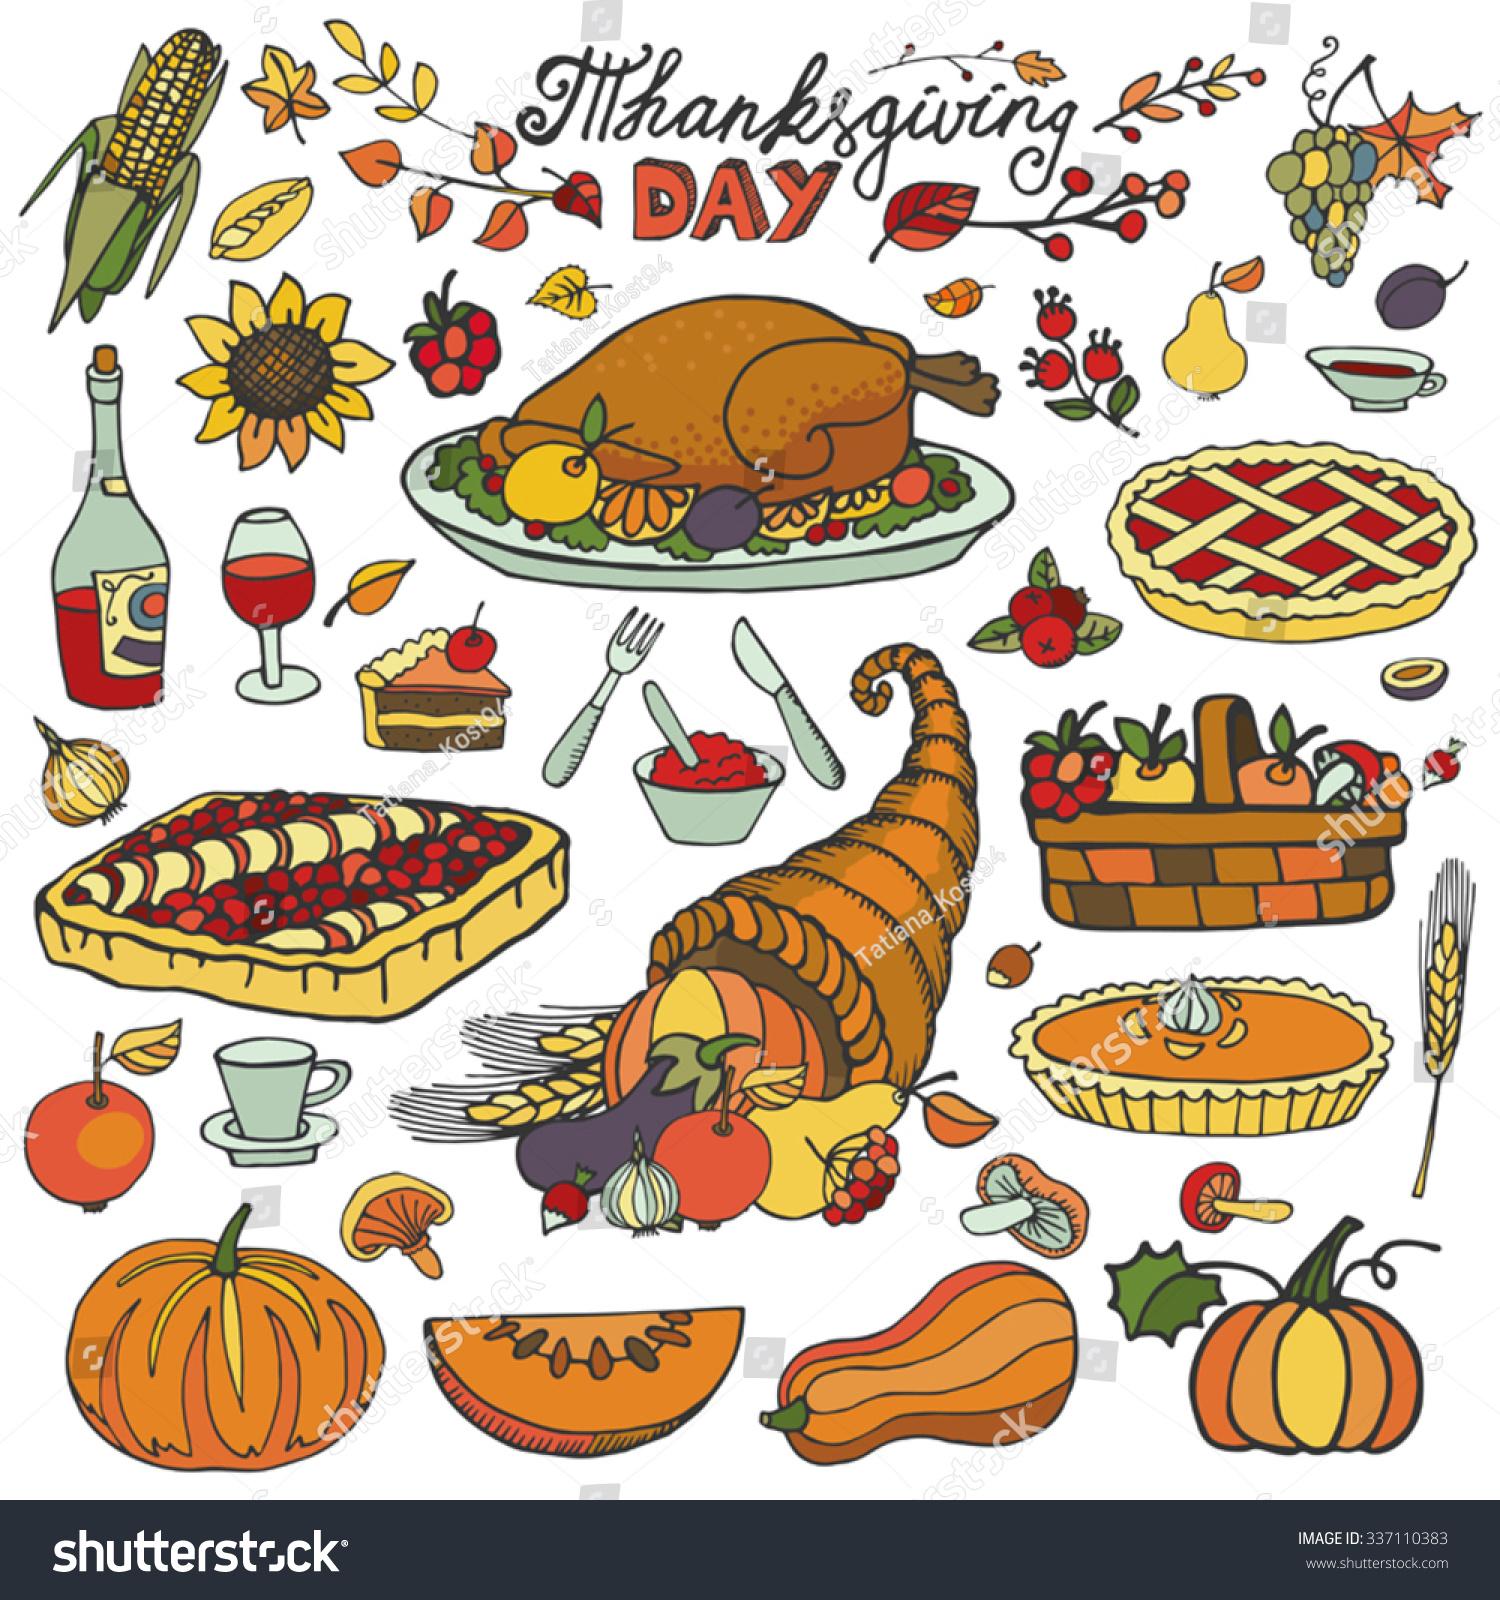 Thanksgiving turkey dinner drawing - photo#19